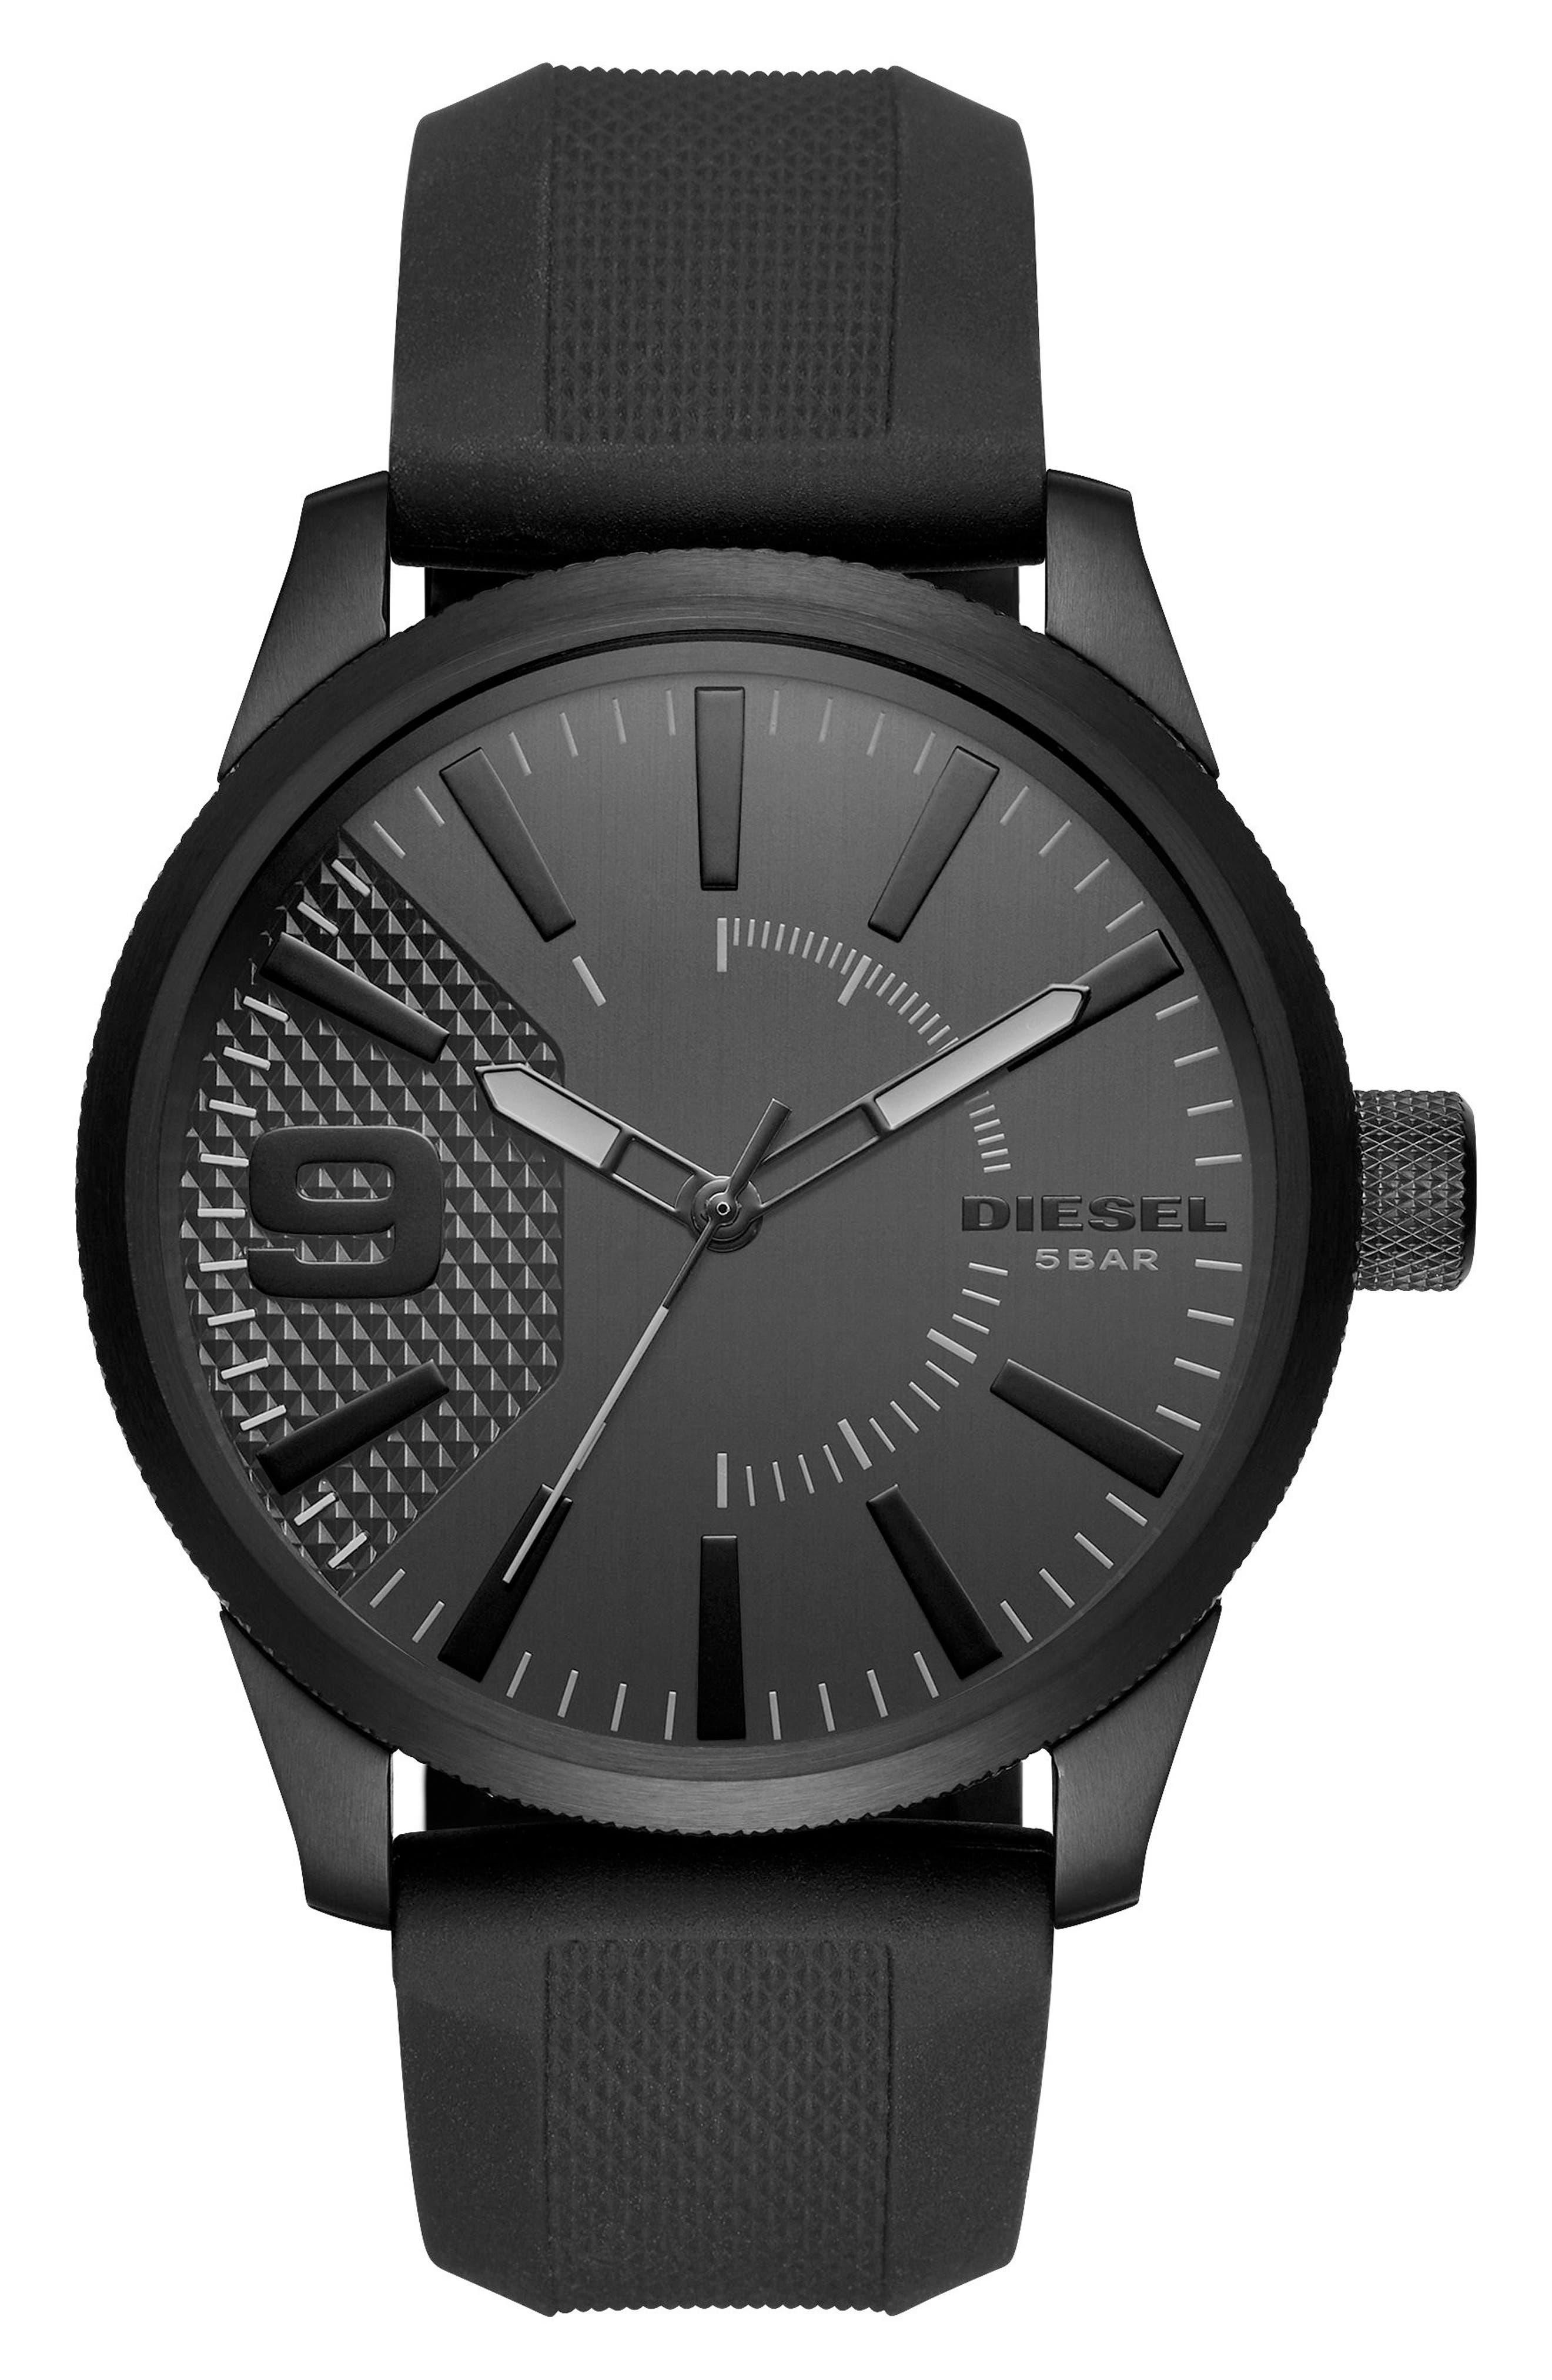 DIESEL® Rasp Silicone Strap Watch, 46mm